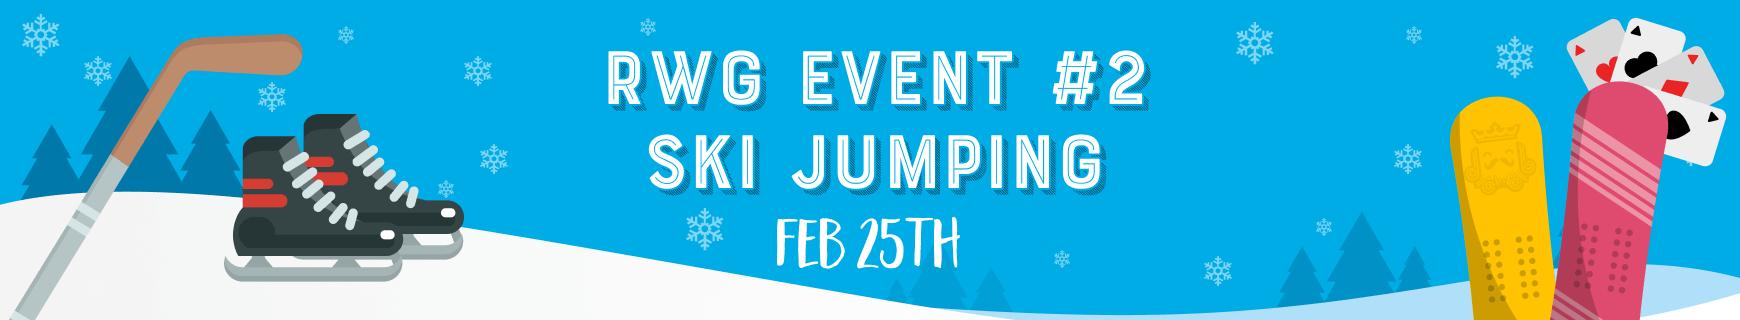 Replay winter games   2   ski jumping   dashboard %28870 x 160%29 x2